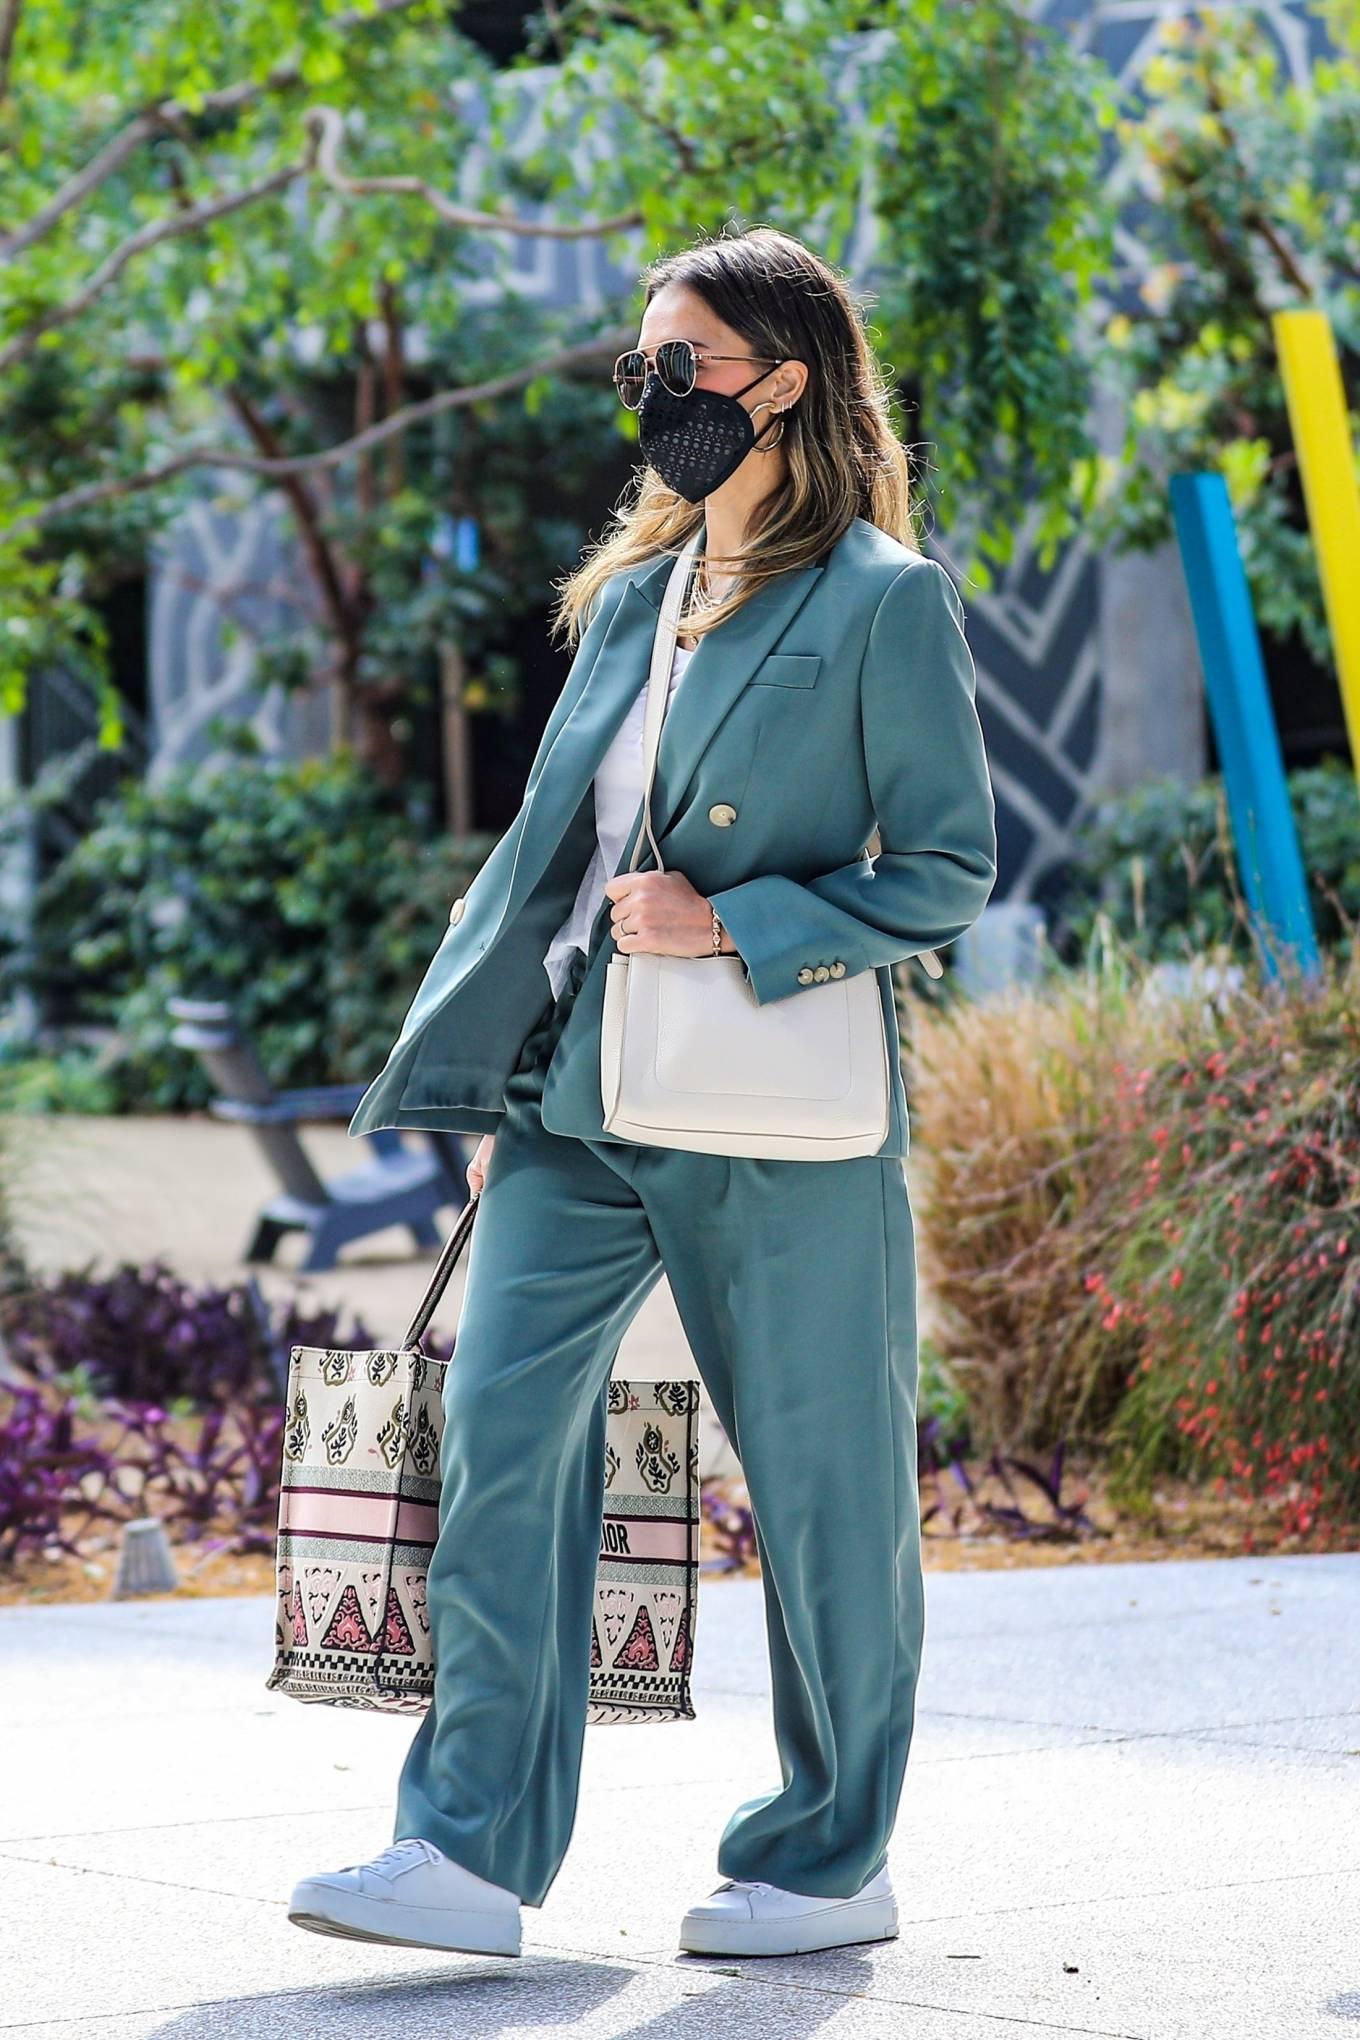 Jessica Alba 2021 : Jessica Alba – Out in a classy suit in Playa Vista-08